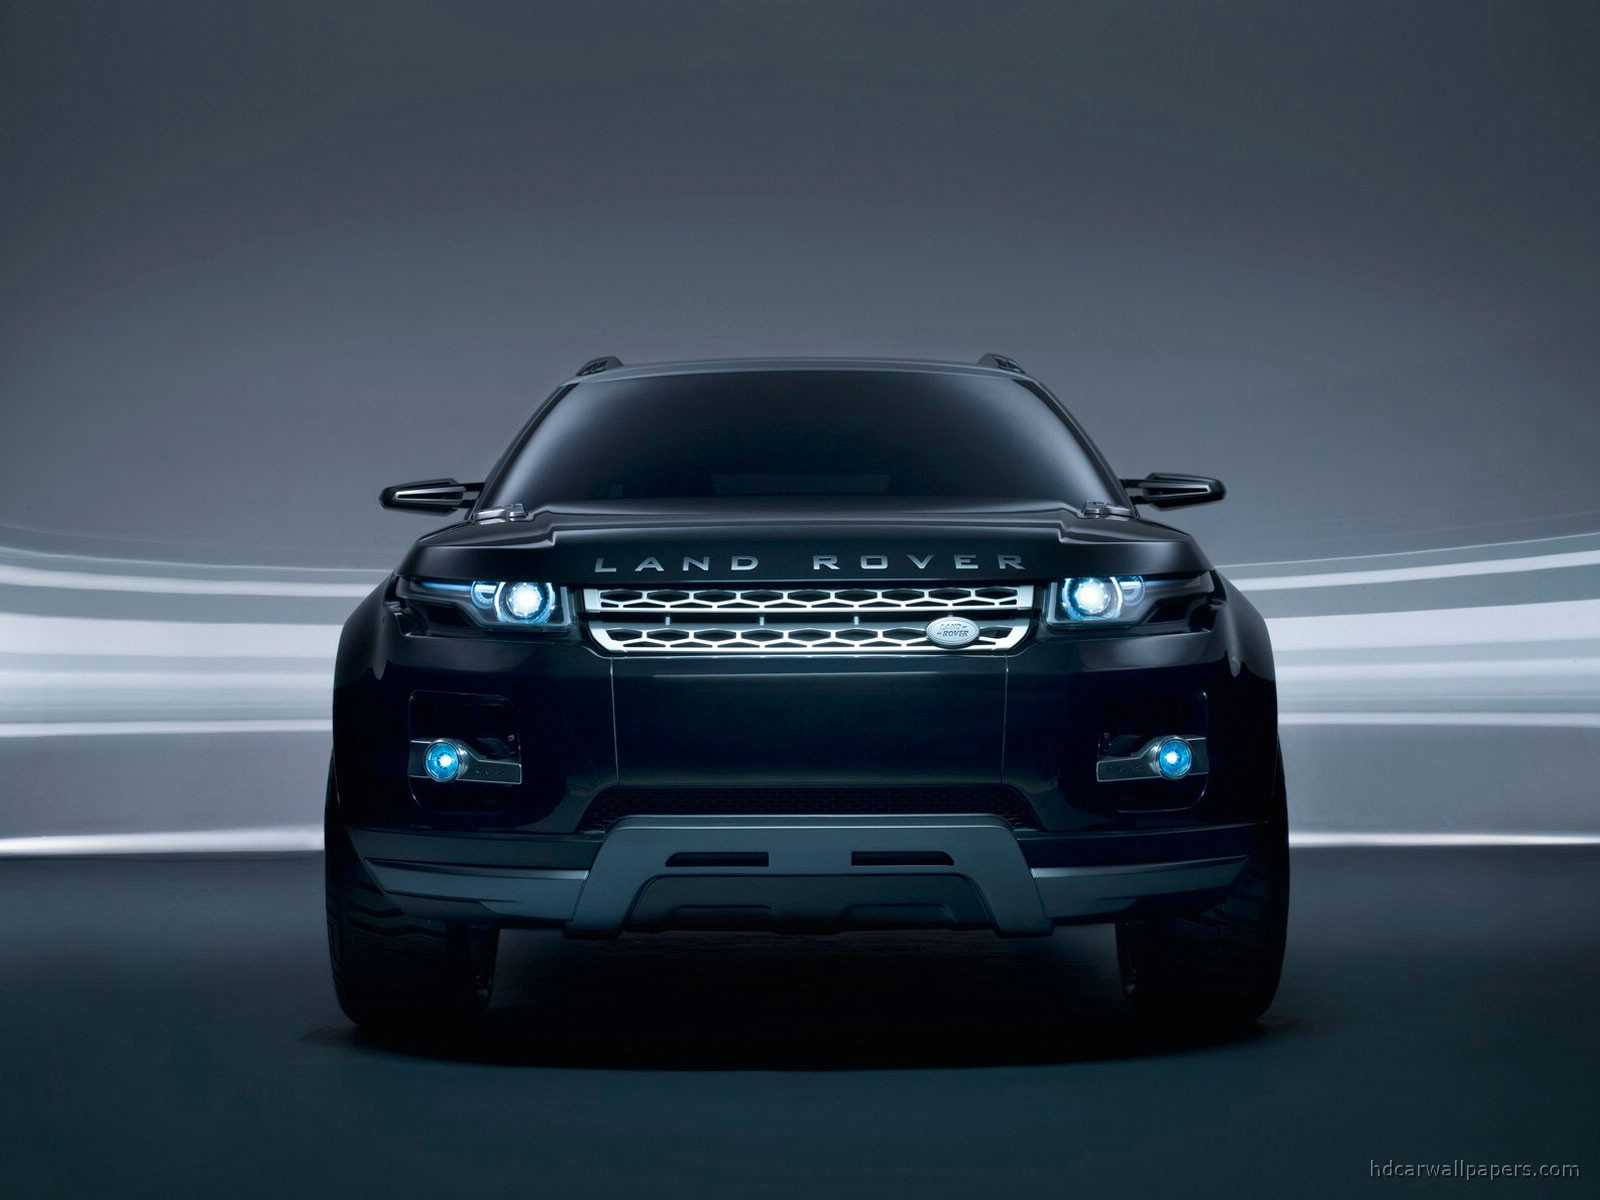 Amazing Land Rover Wallpaper